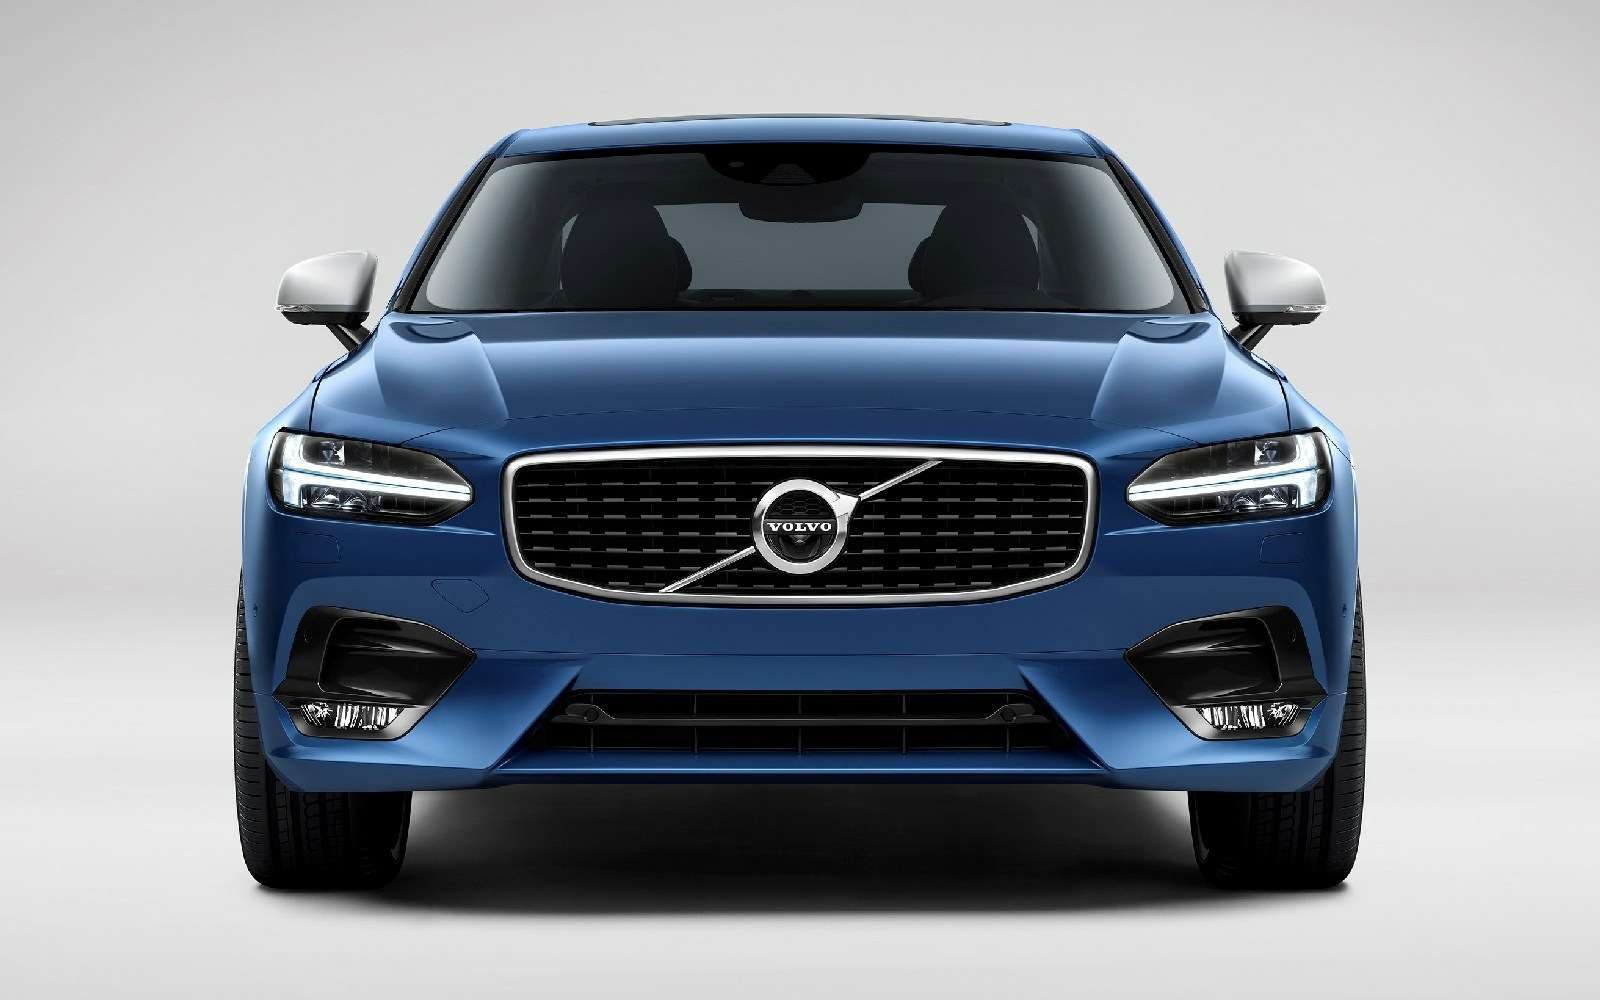 Volvo подготовила дляфлагманской модели спортпакет R-Design— фото 600923